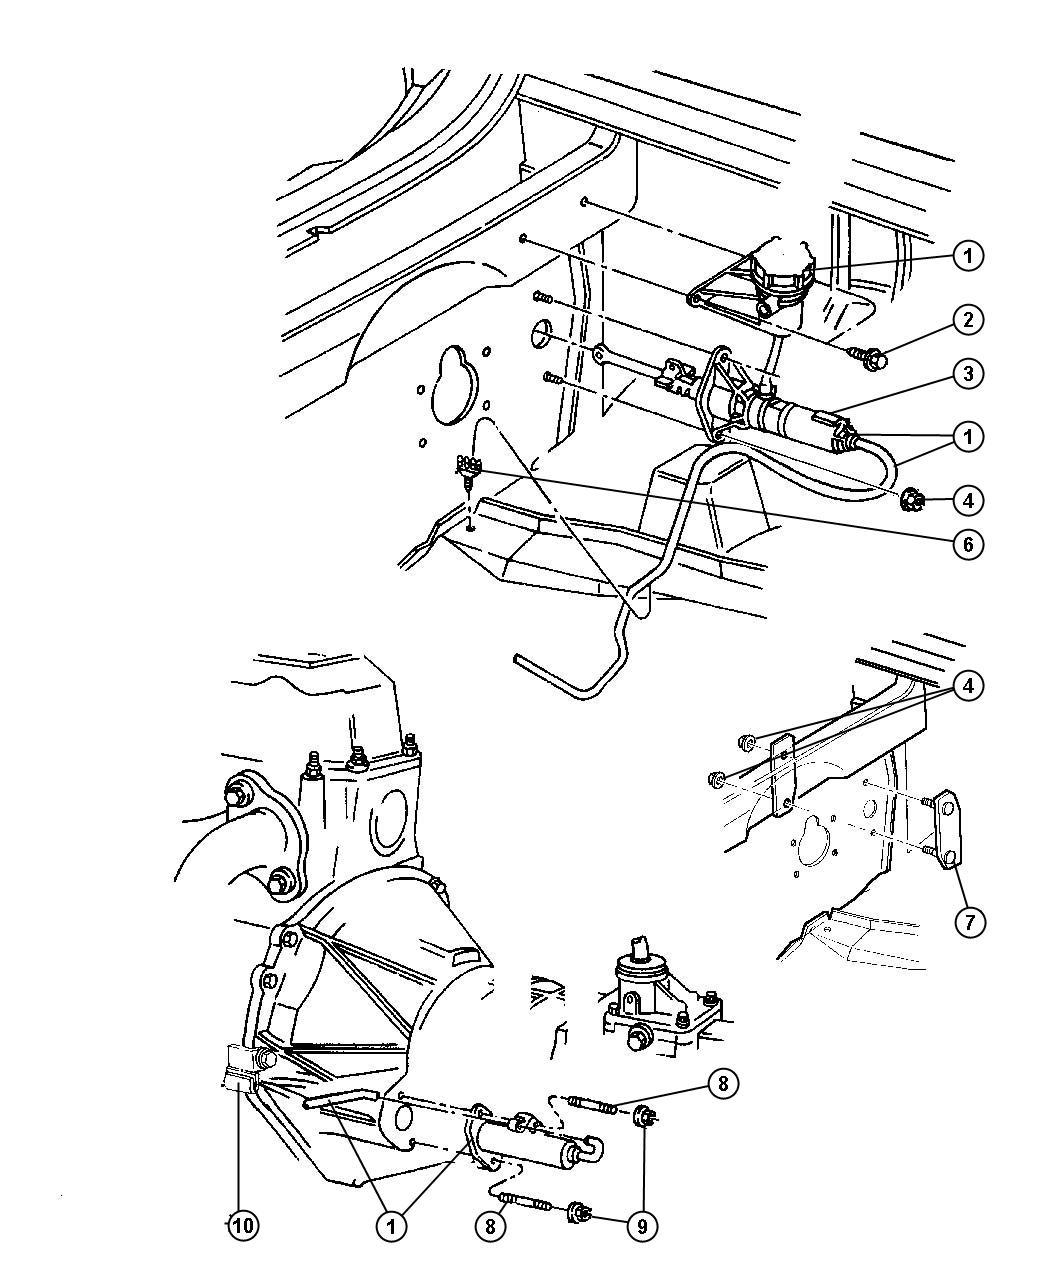 14 Dodge Ram Radio Wiring Diagram